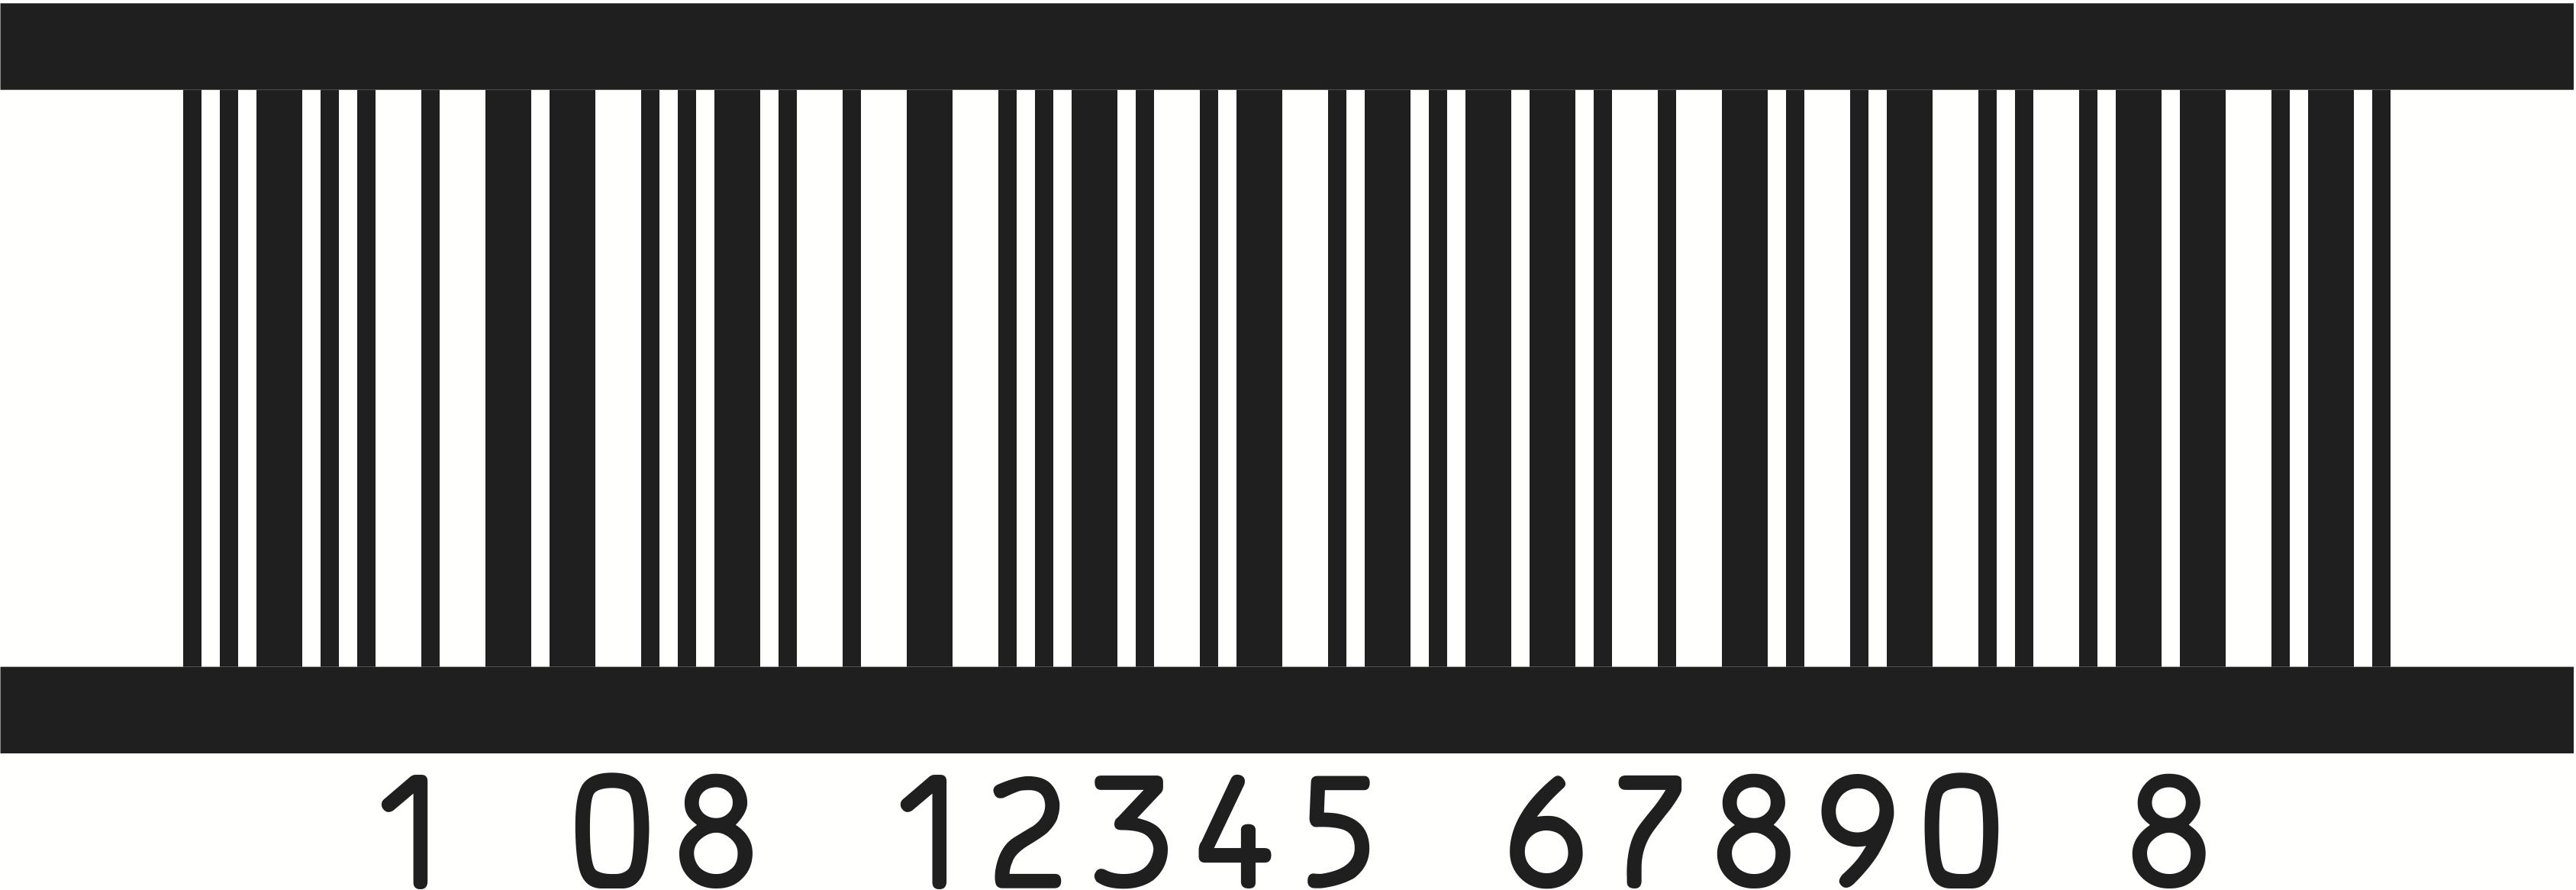 gtin14-100-partialbb